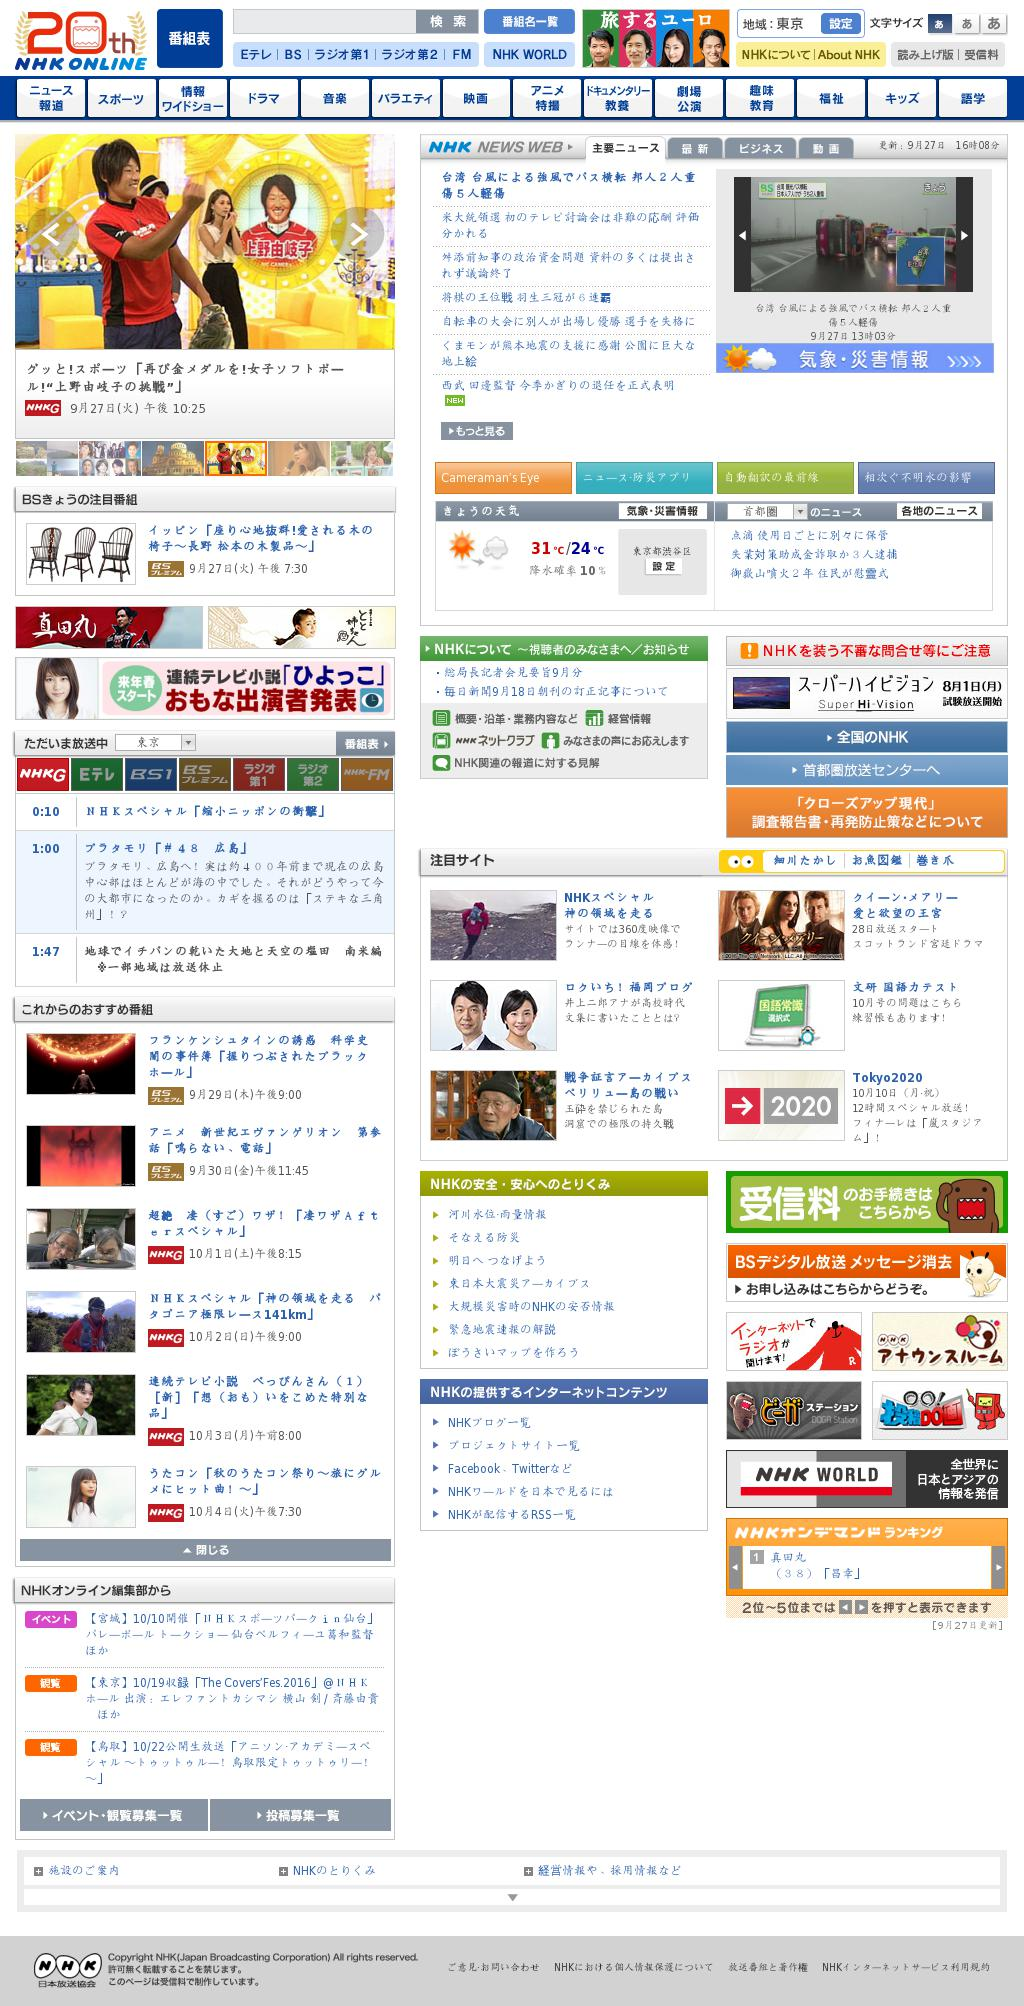 NHK Online at Tuesday Sept. 27, 2016, 4:12 p.m. UTC